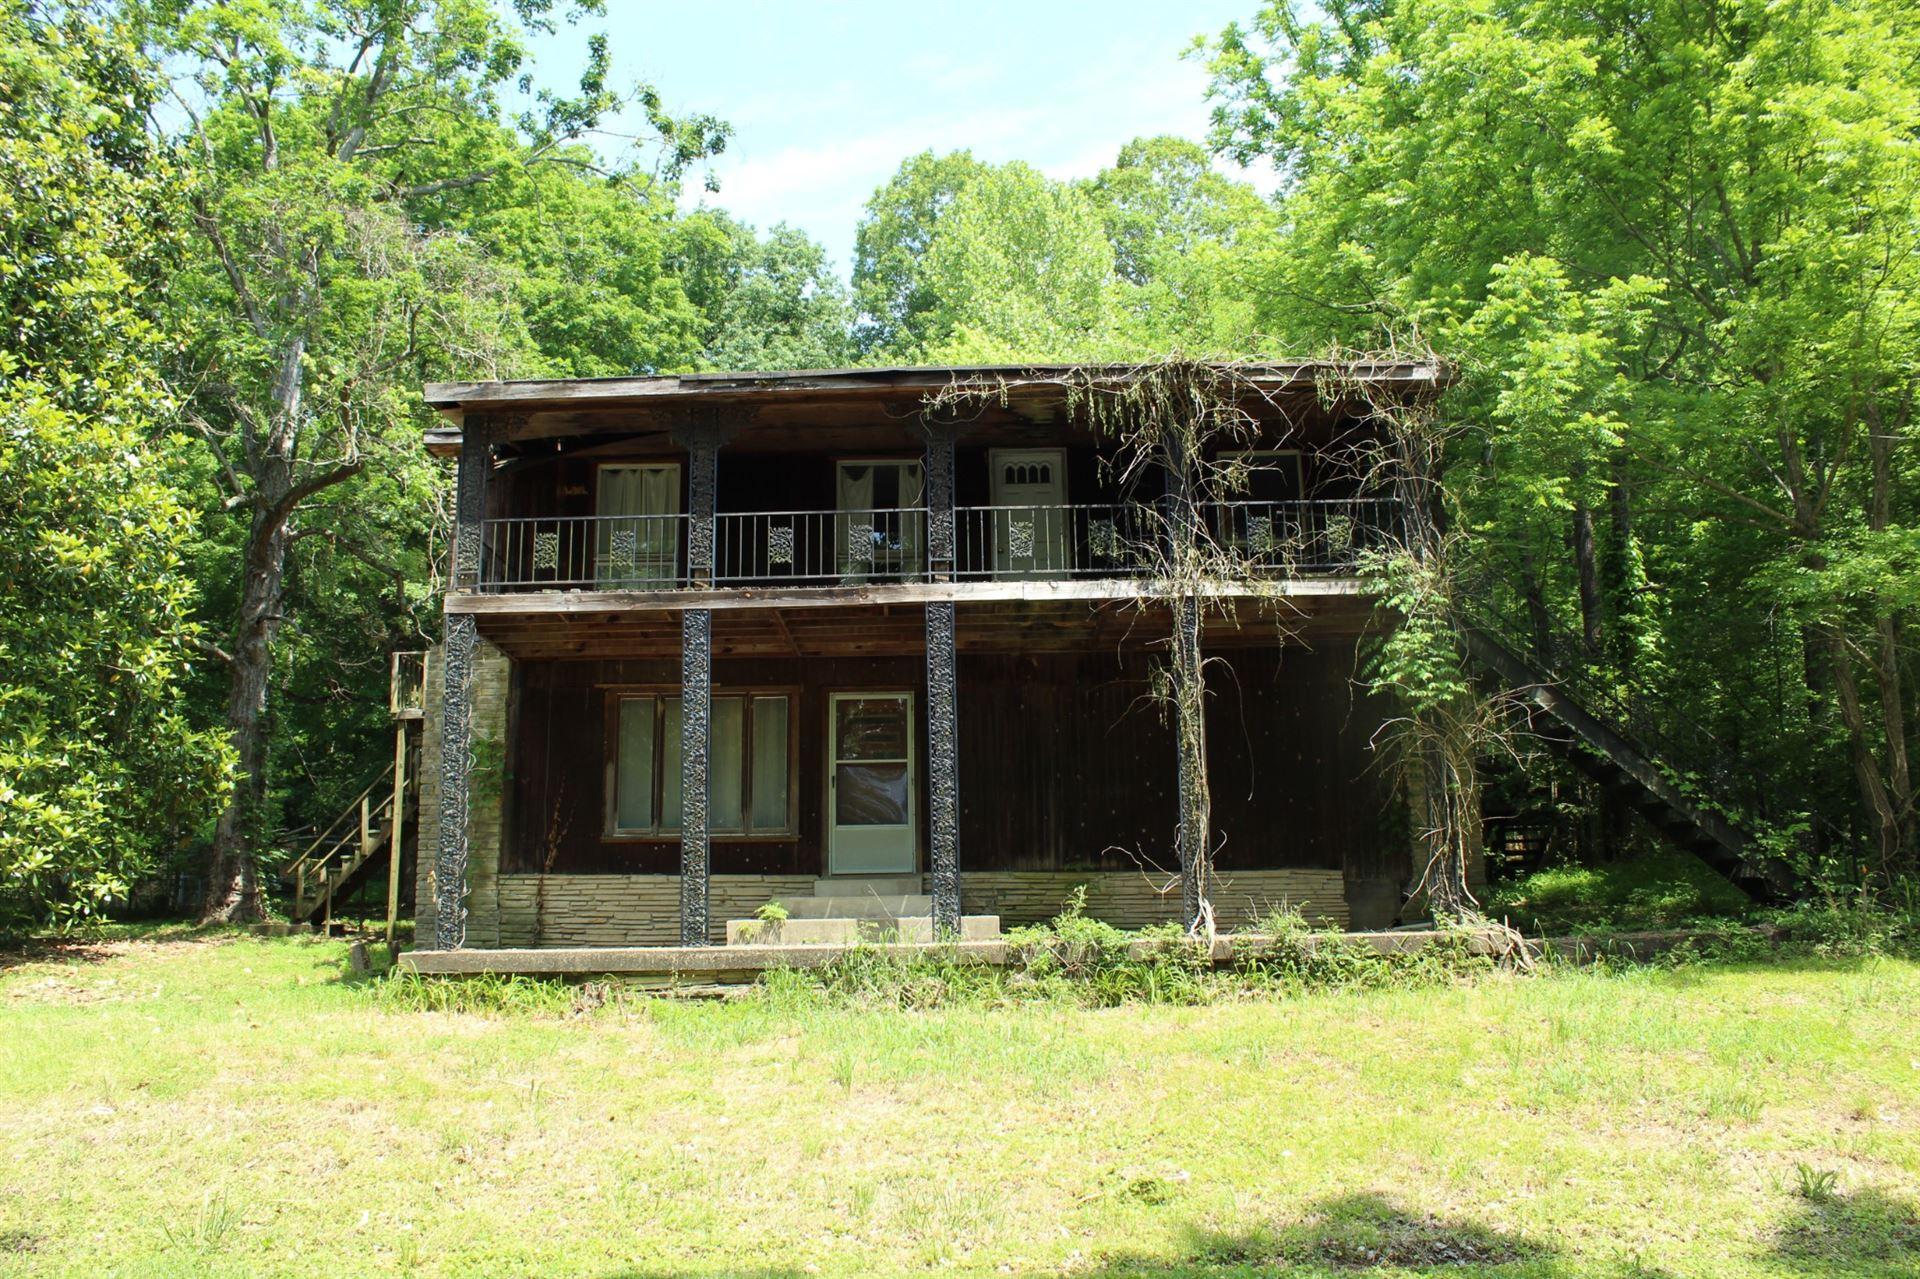 751 McAdoo Creek Rd, Clarksville, TN 37043 - MLS#: 2154476